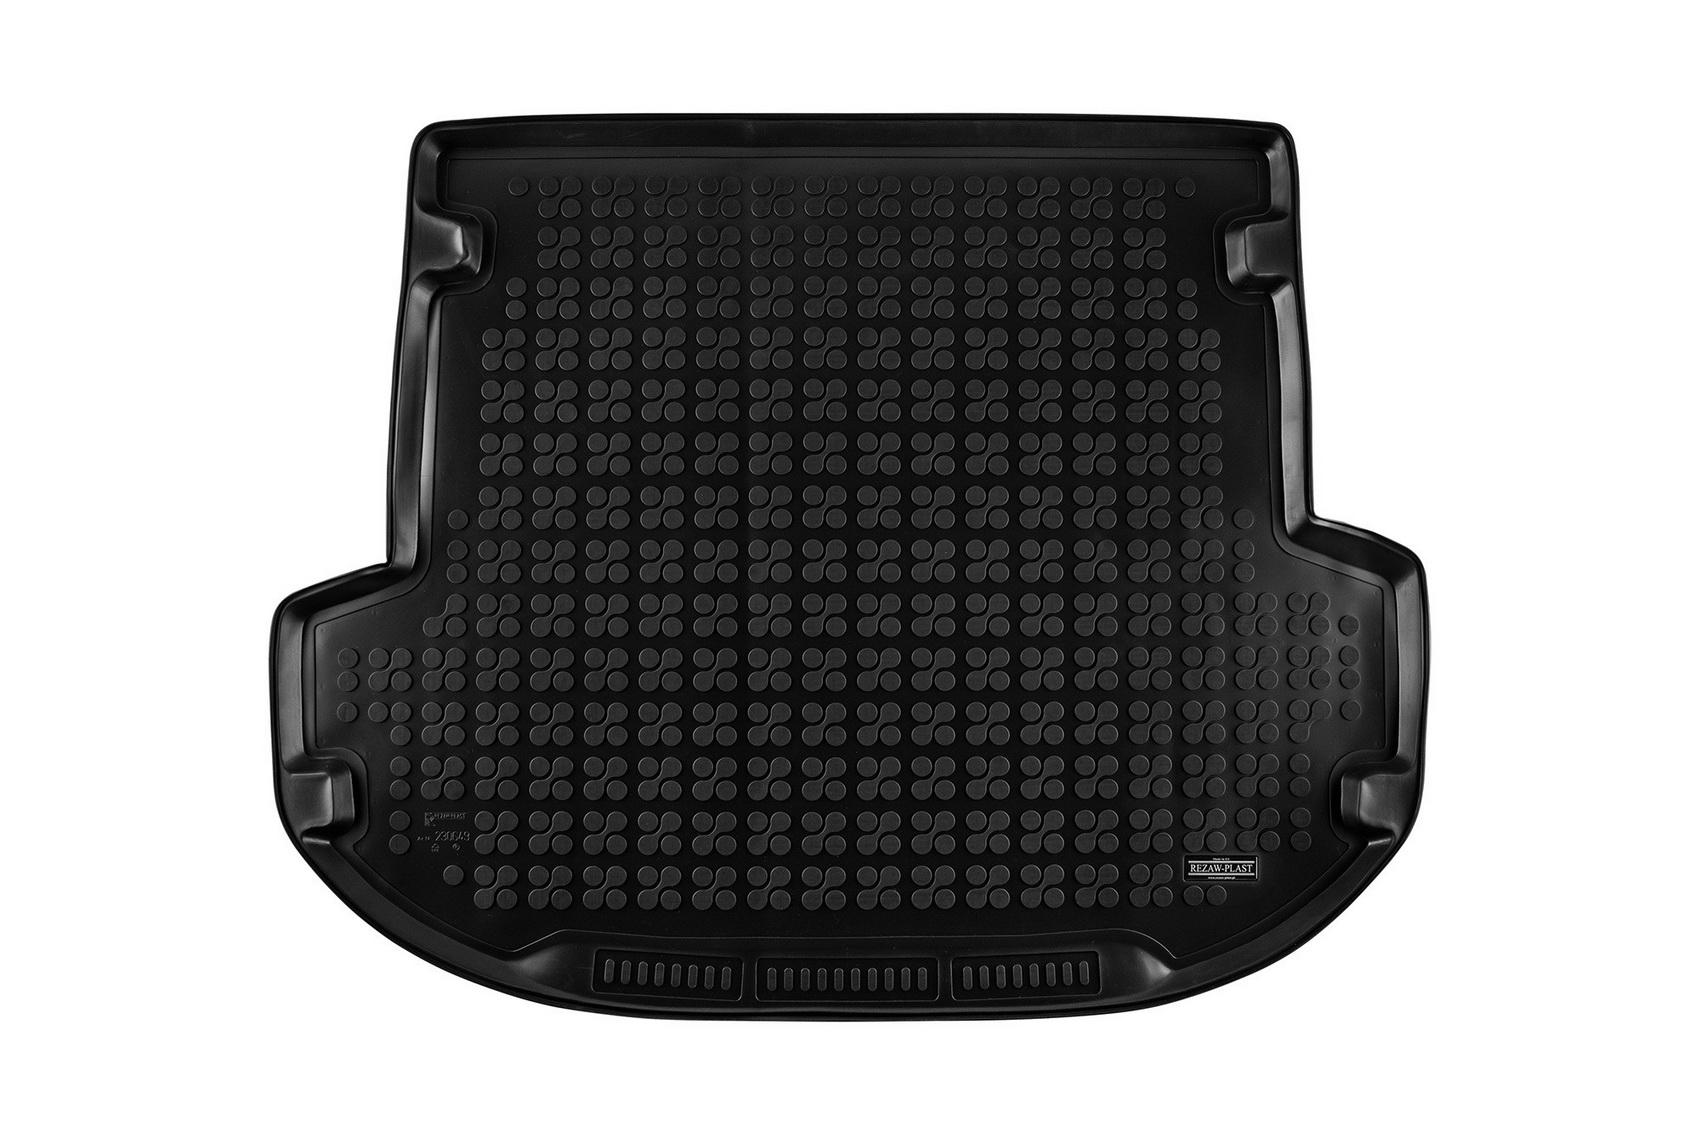 Covoras Tavita portbagaj compatibil cu Hyundai SANTE Fe IV TM 5 locuri (2018-) Negru